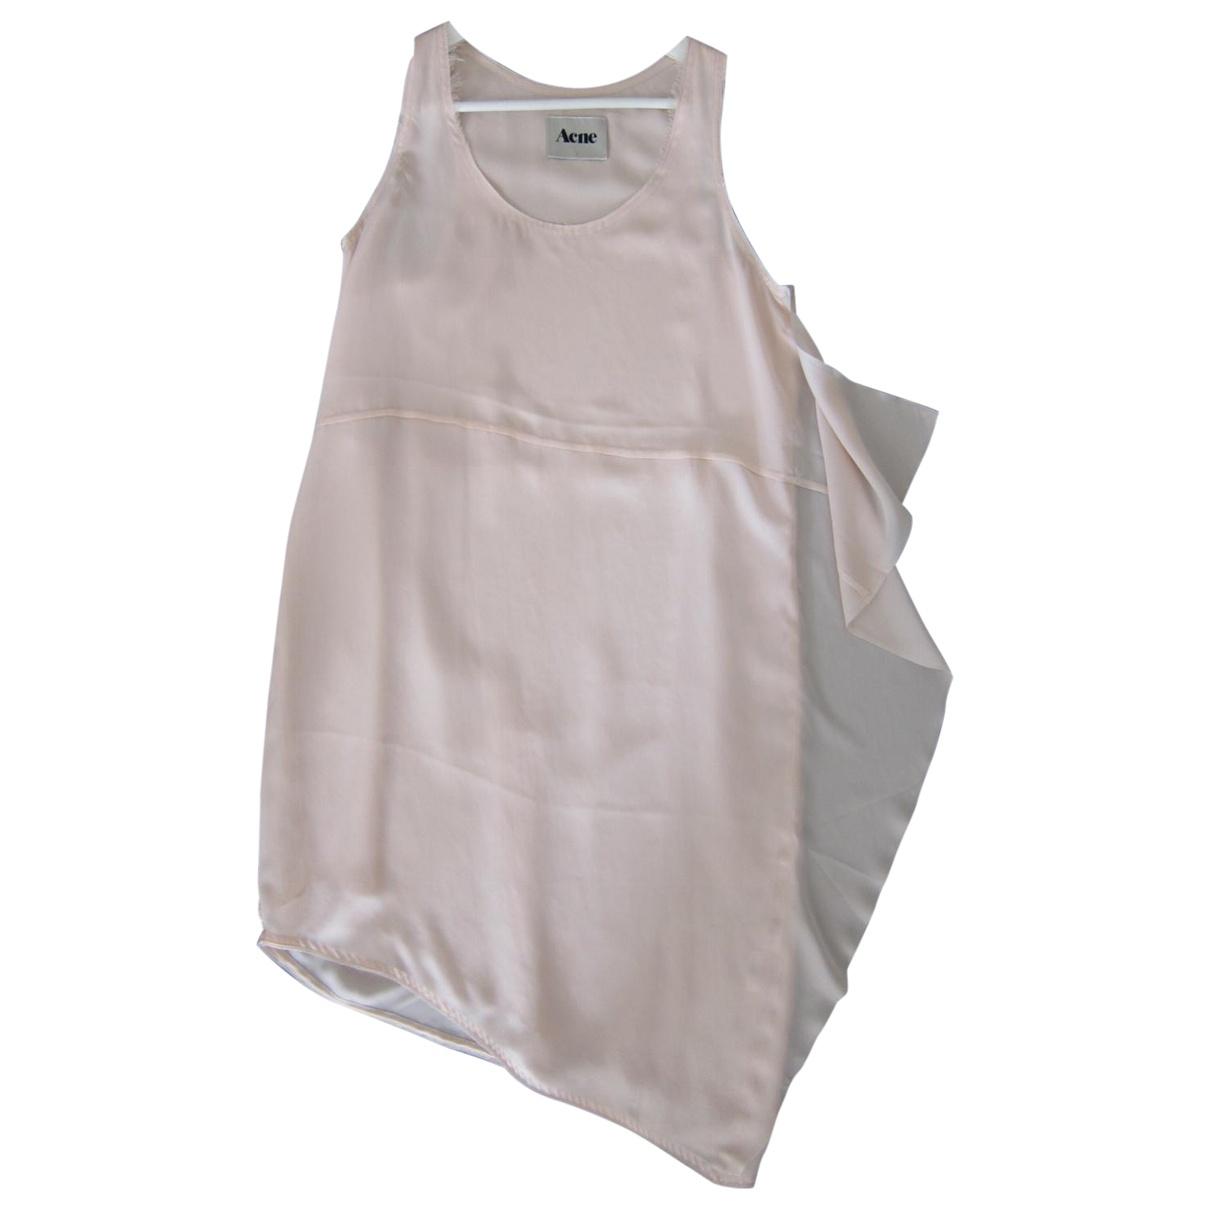 Acne Studios Pink Silk Dress